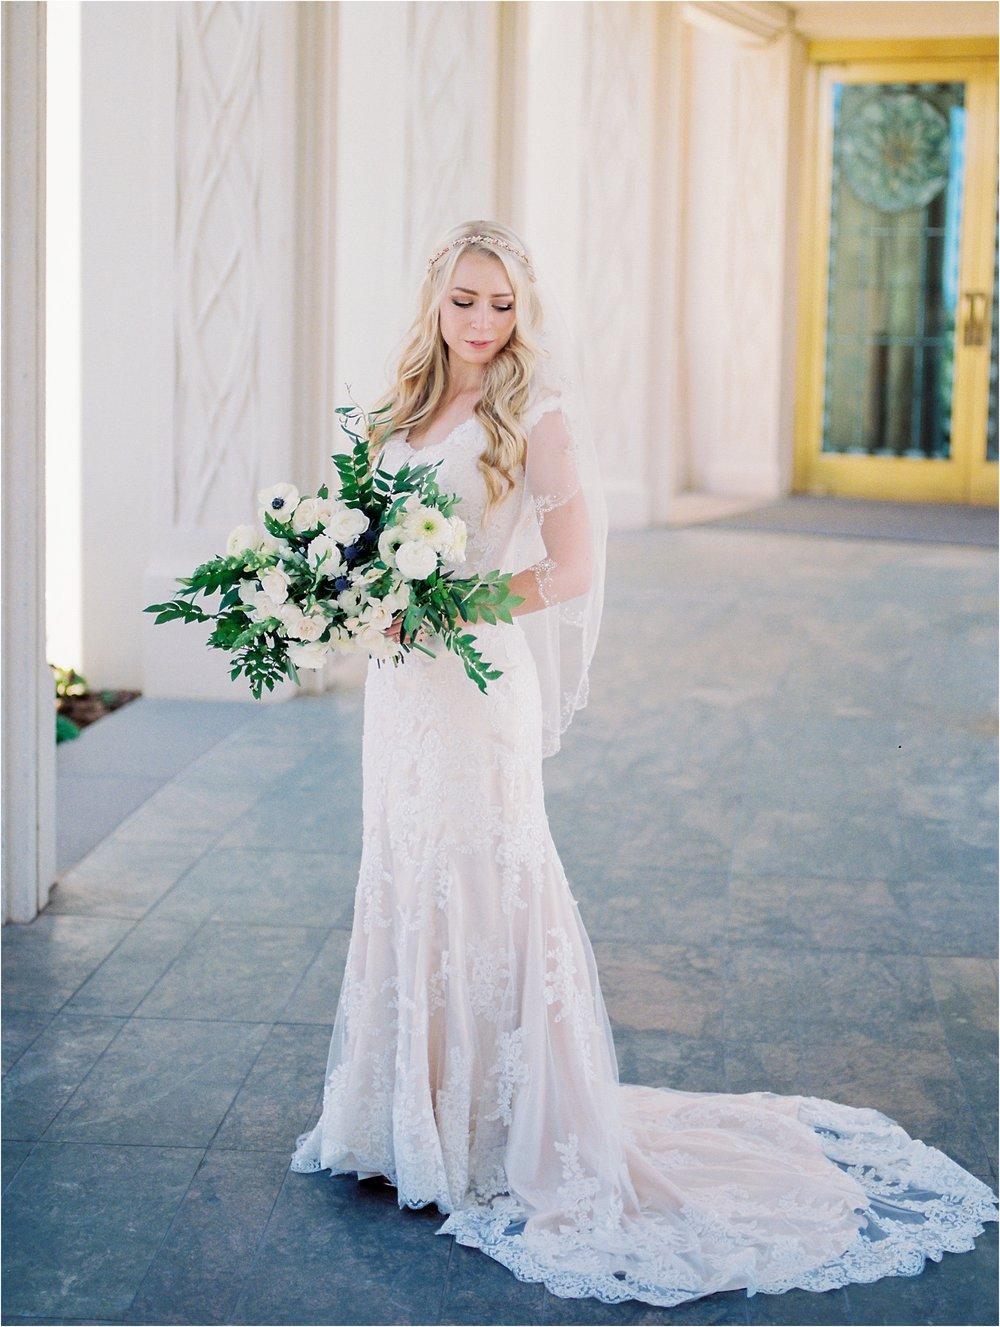 Sarah Jane Photography Film Hybrid Scottsdale Phoenix Arizona Destination Wedding Photographer Julie ans Mason_0001.jpg